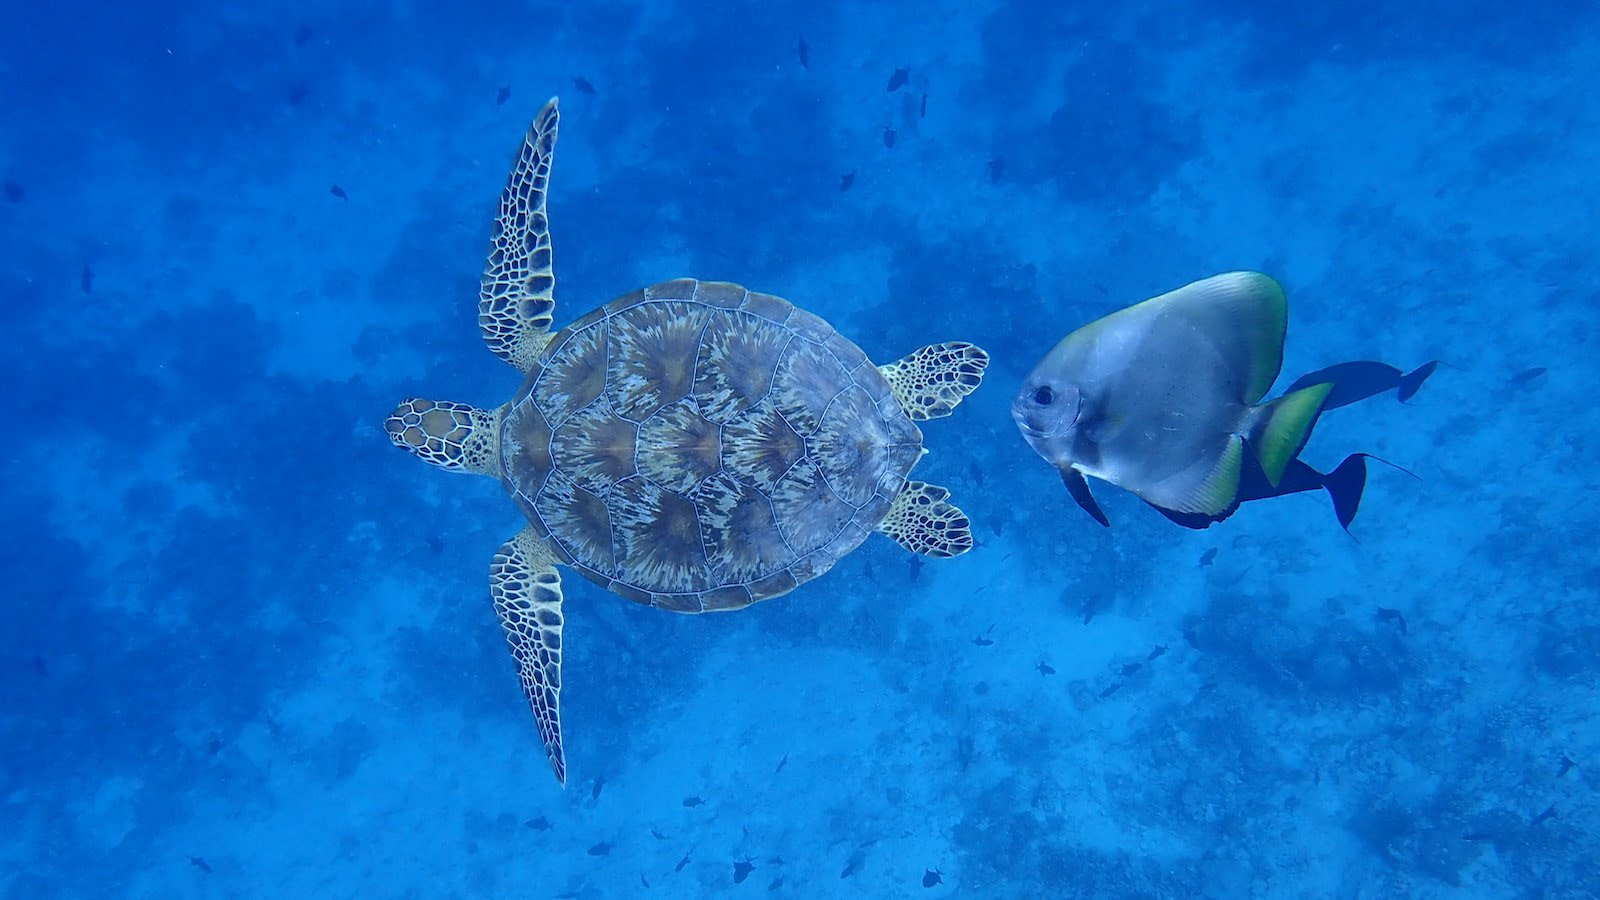 Turtle and batfish - underwater symbiotic relationships